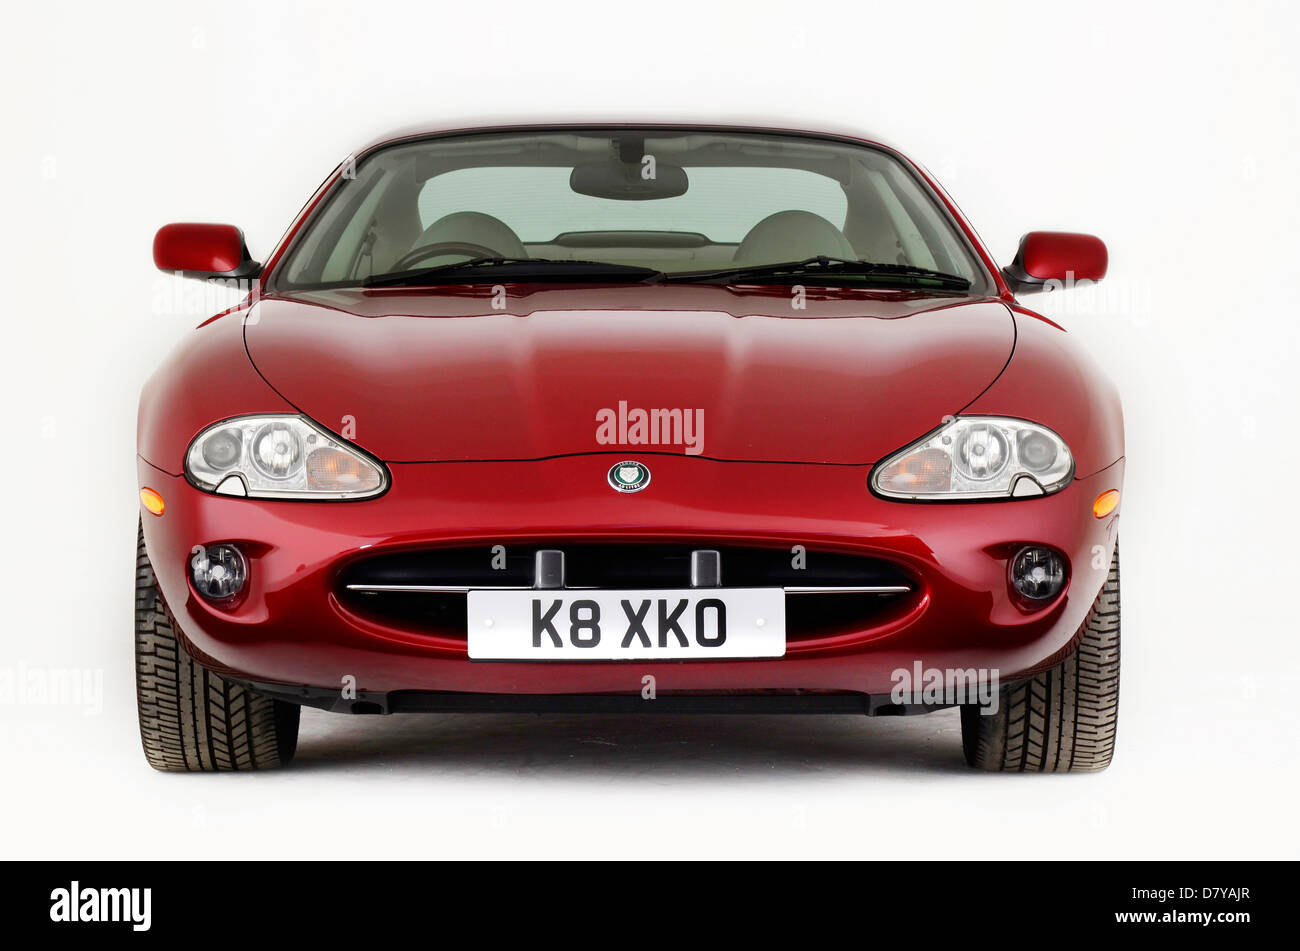 1999 Jaguar XK8 Coupe - Stock Image